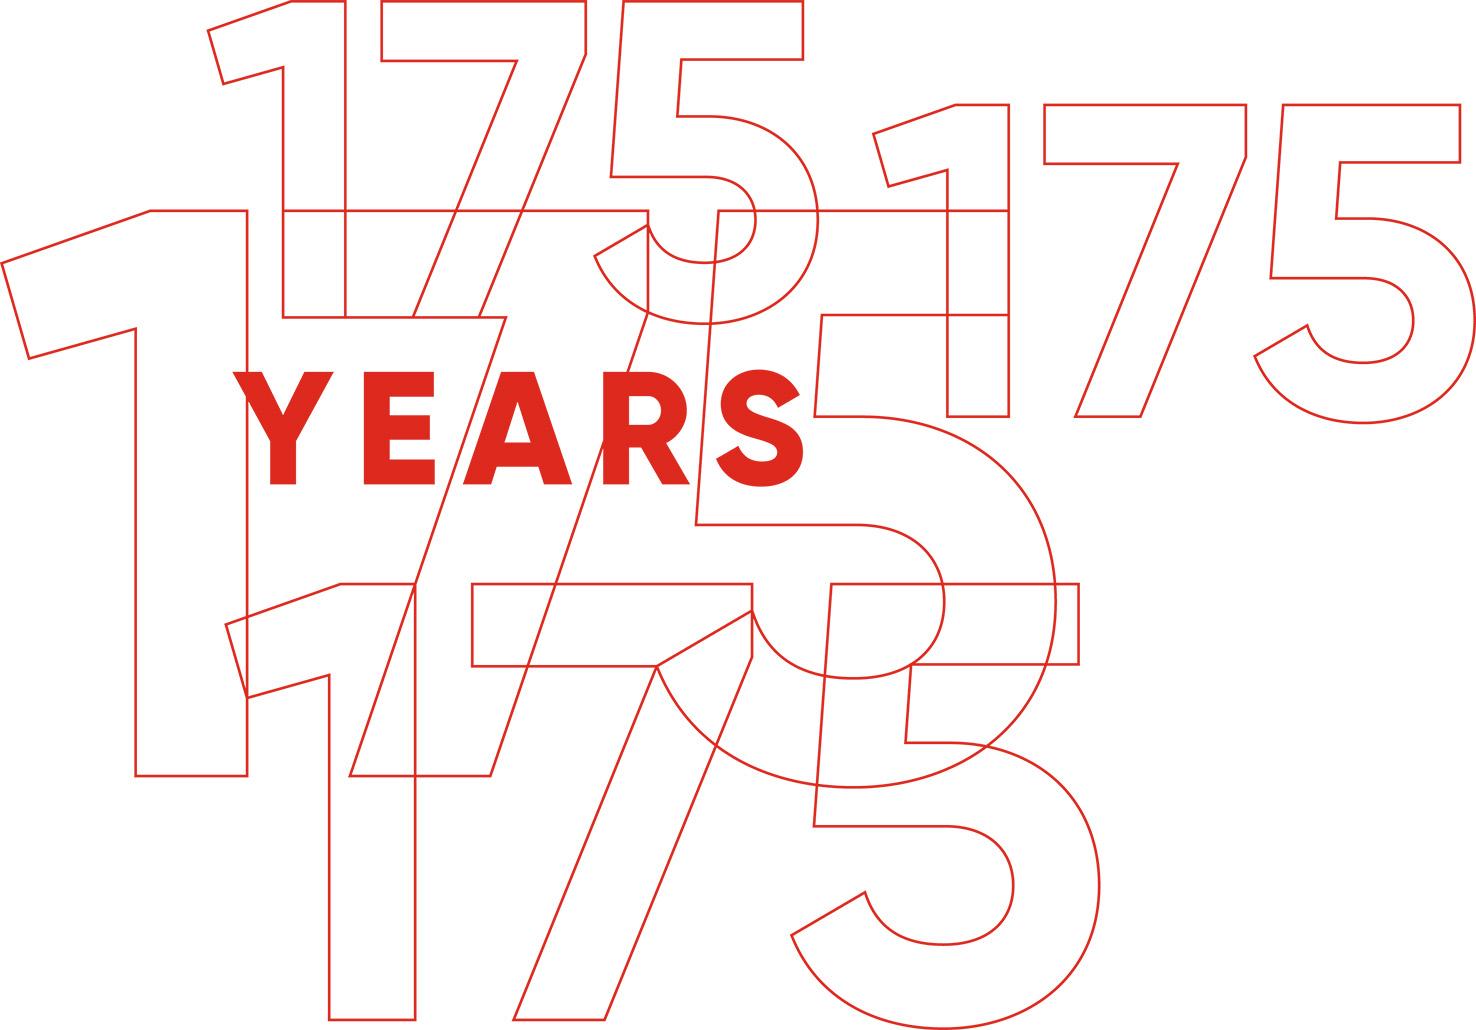 2019 - Burckhardt Compression celebrates its 175 year anniversary